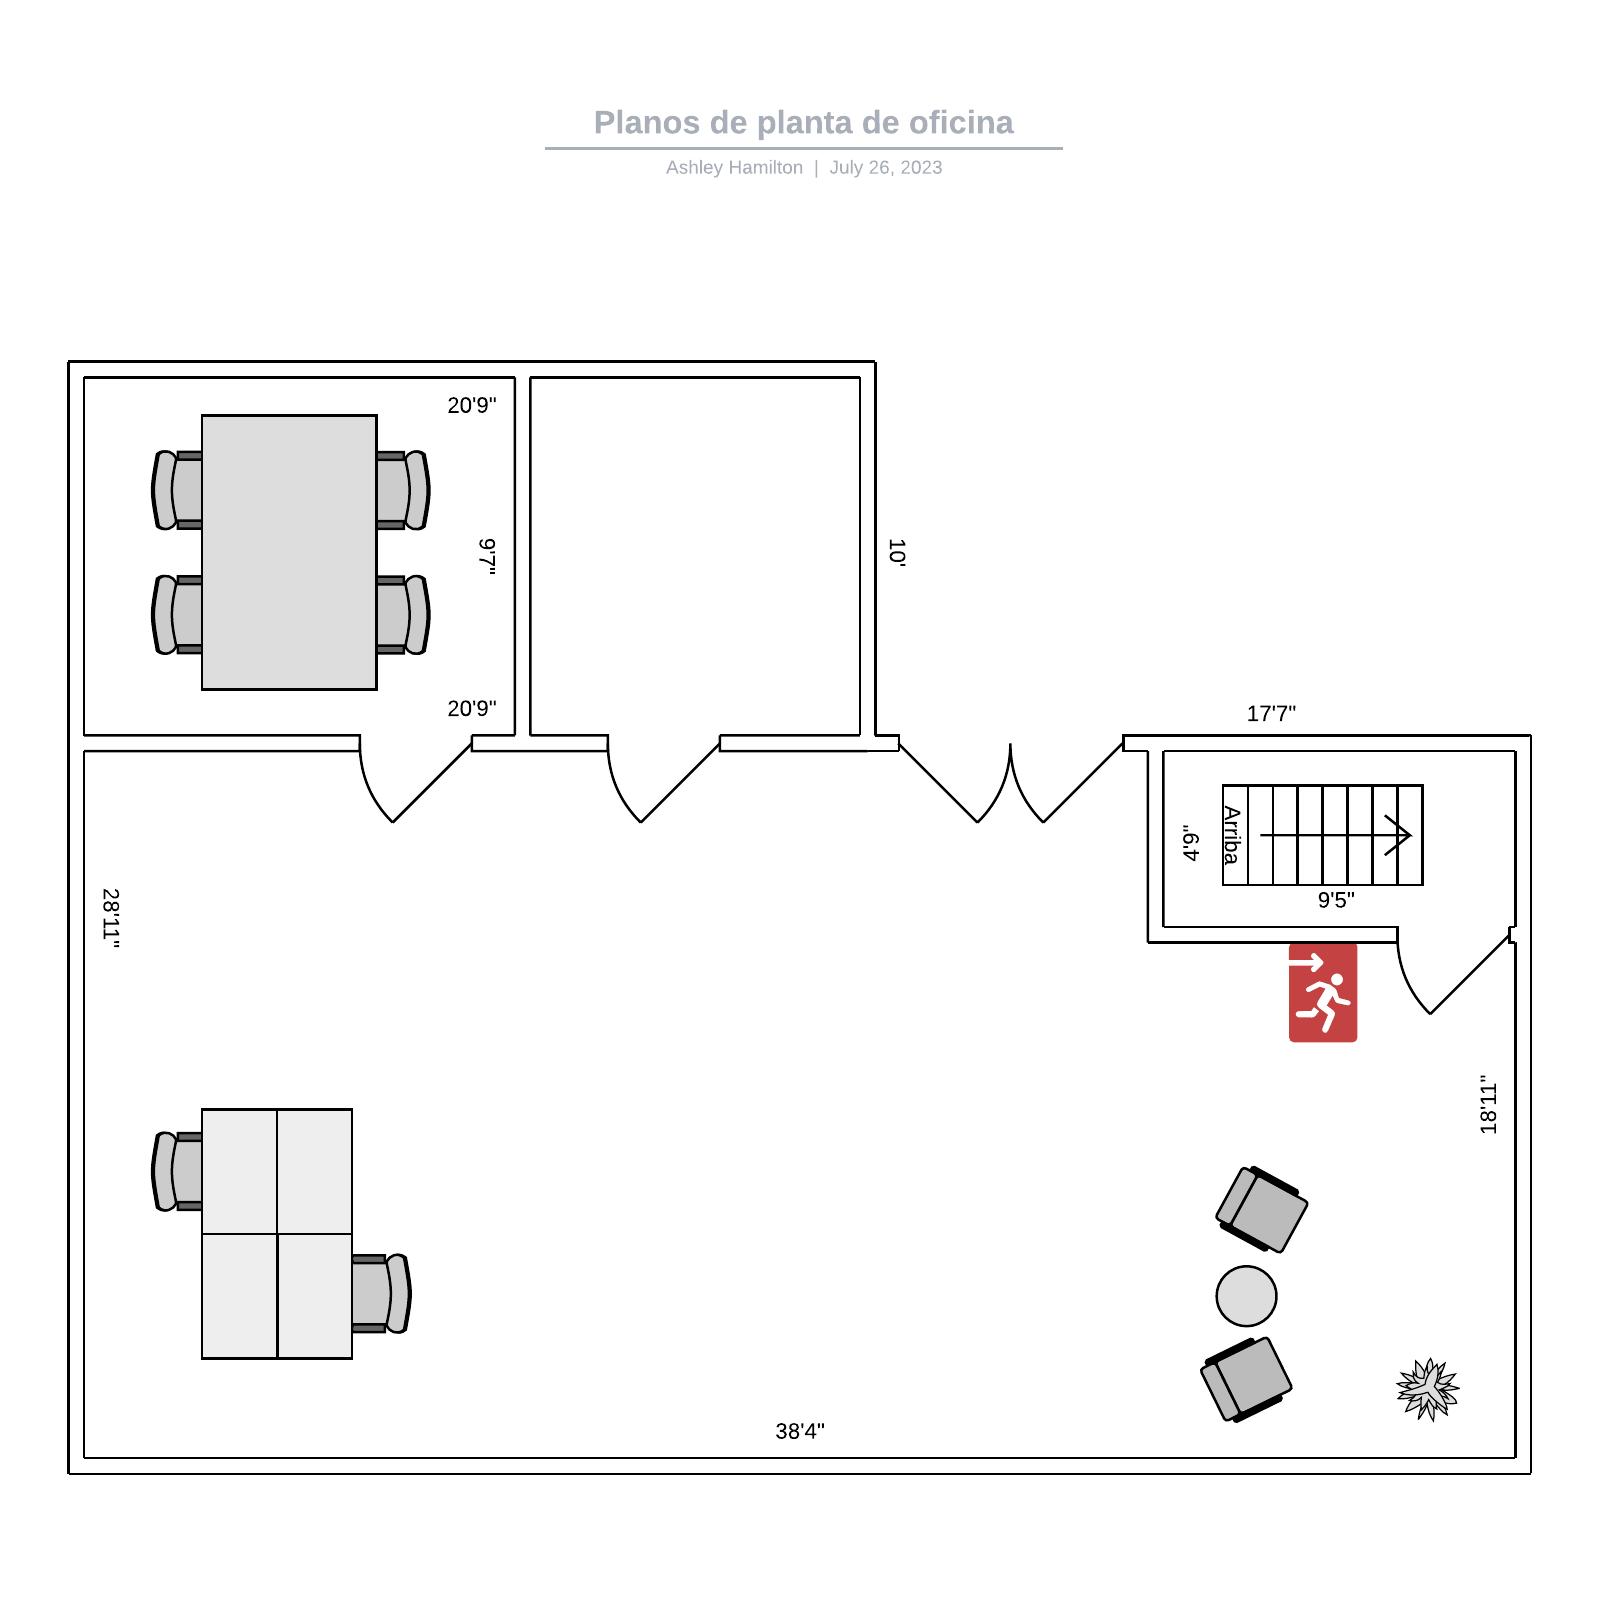 Planos de planta de oficina